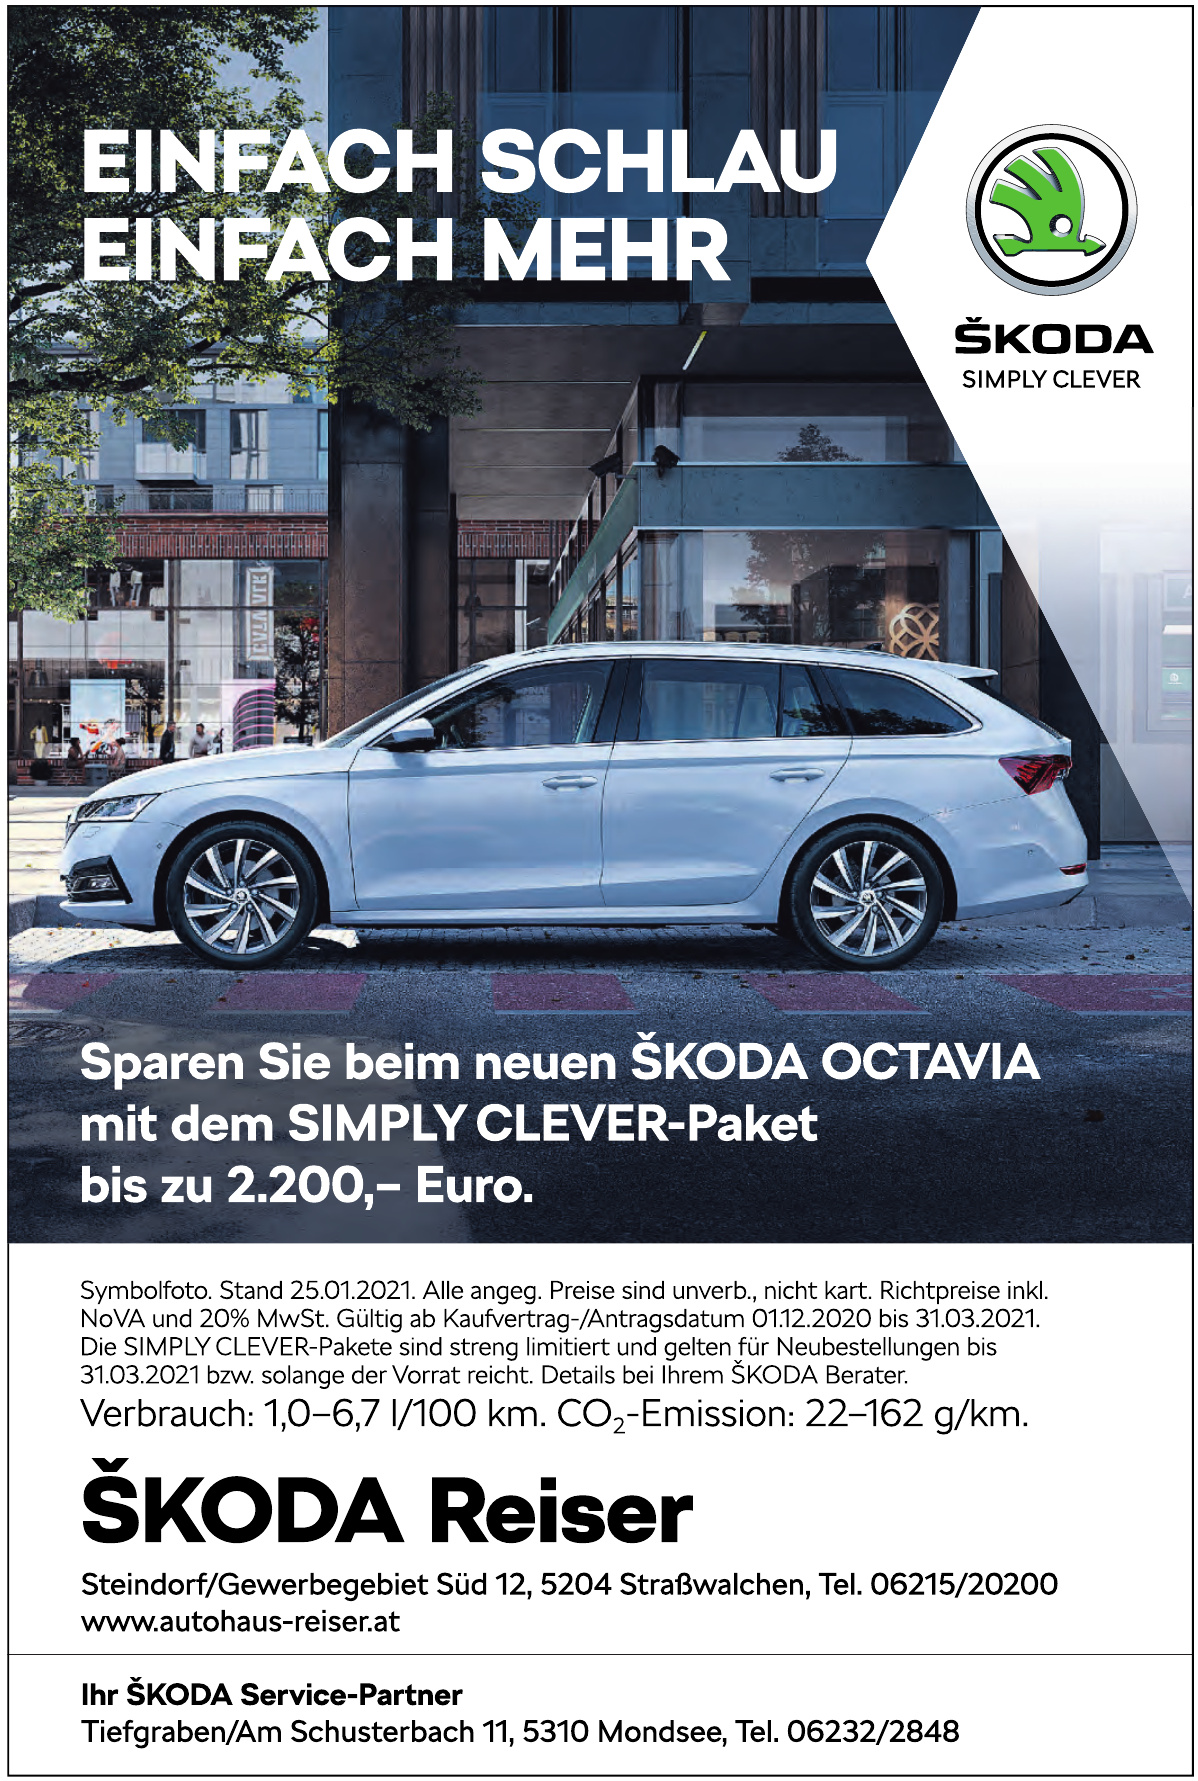 Škoda Reiser